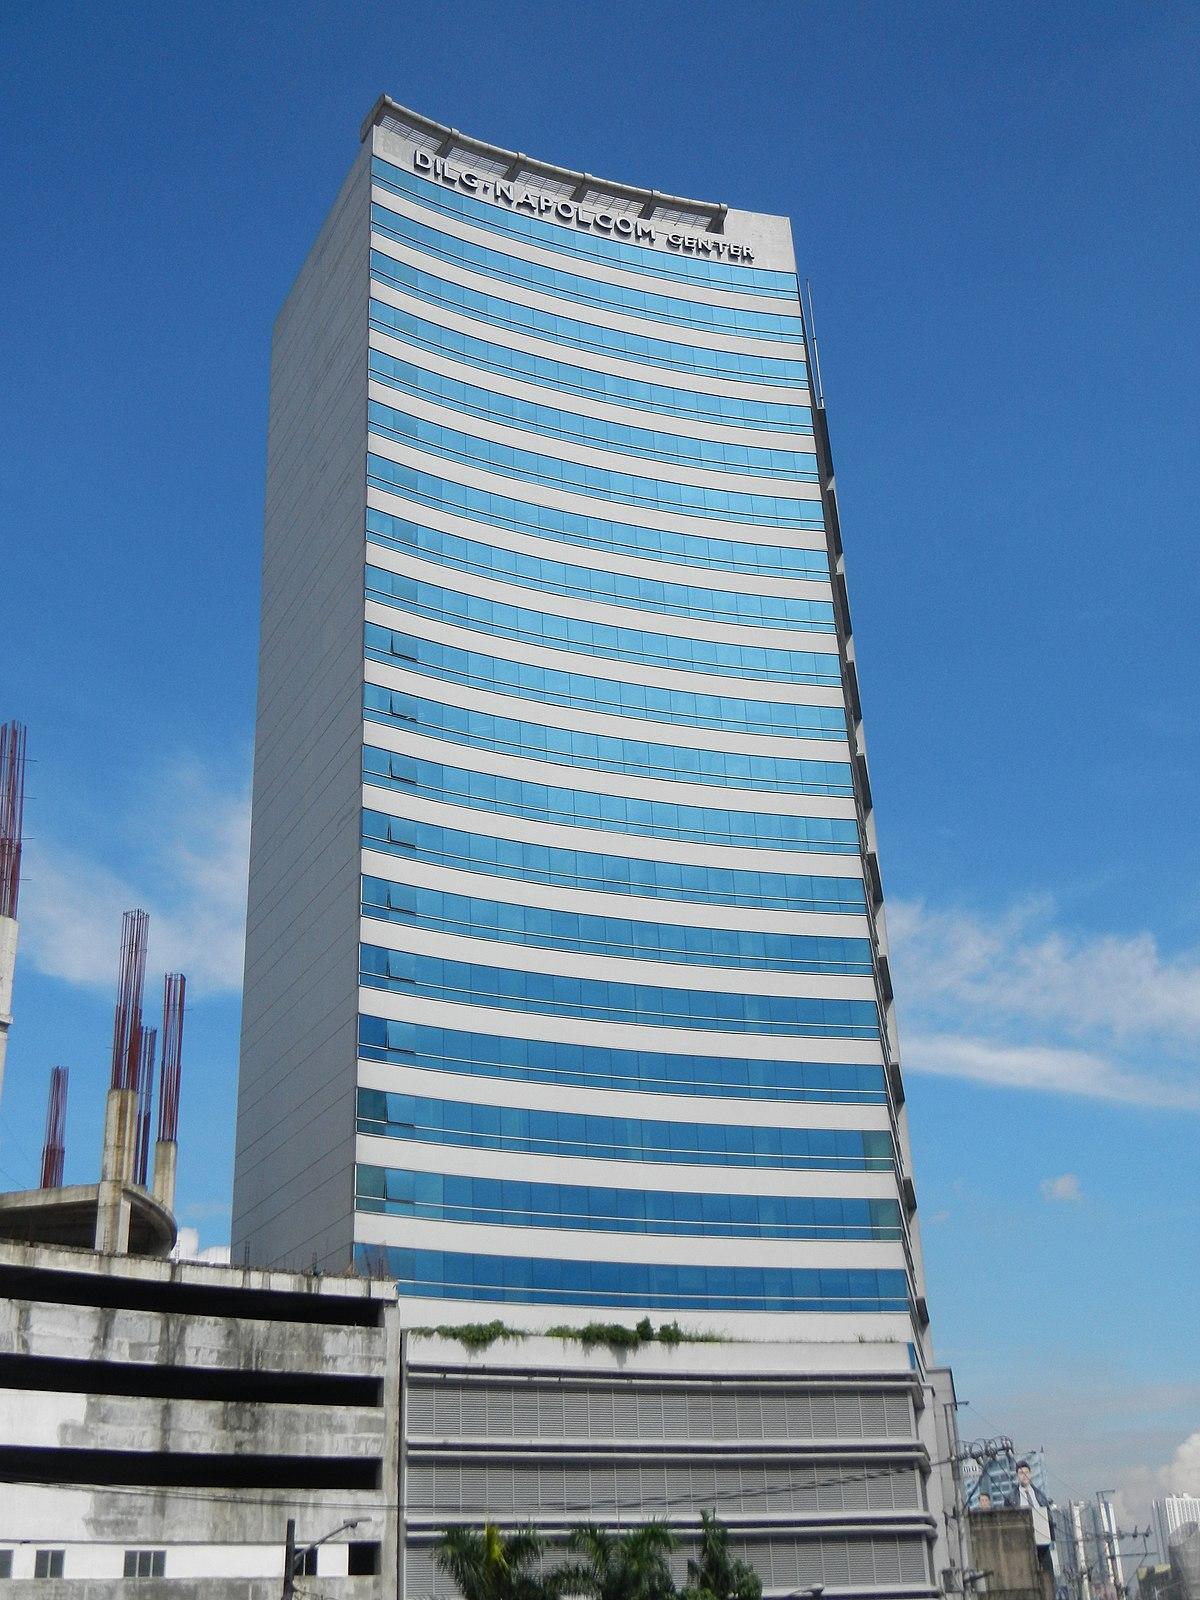 Dilg Napolcom Center Wikipedia